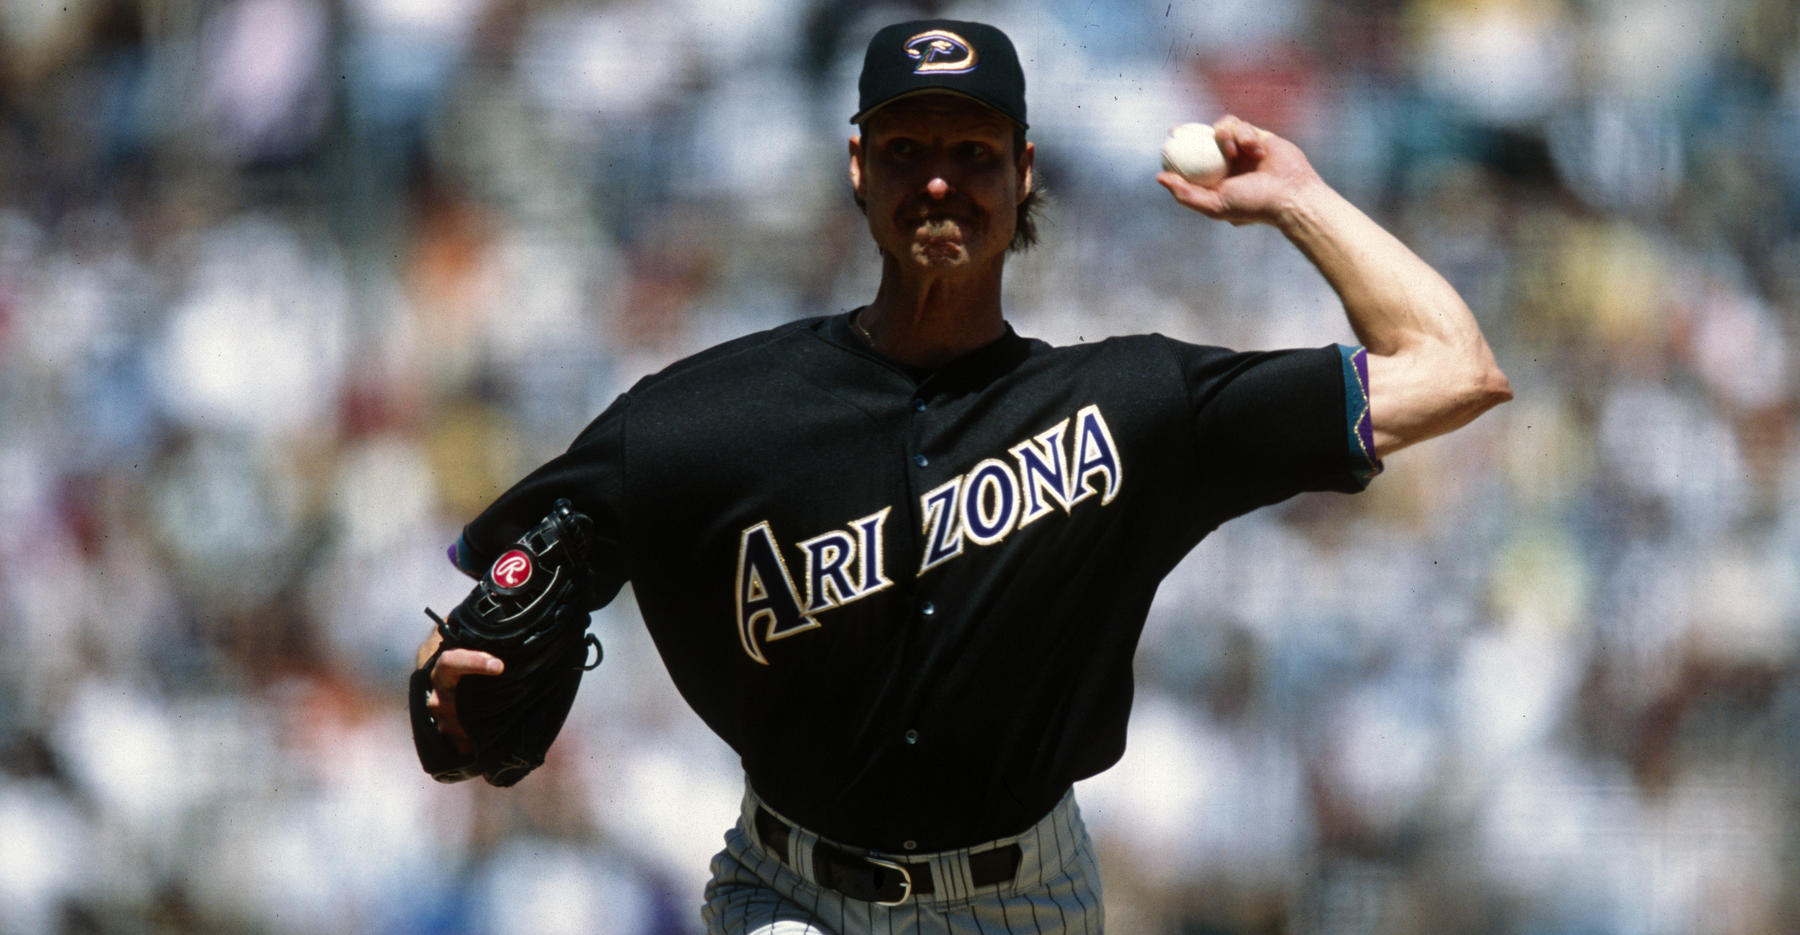 Game action of Randy Johnson of the Arizona Diamondbacks May 28, 2001. BL-12-2012-965 (Brad Mangin / National Baseball Hall of Fame Library)